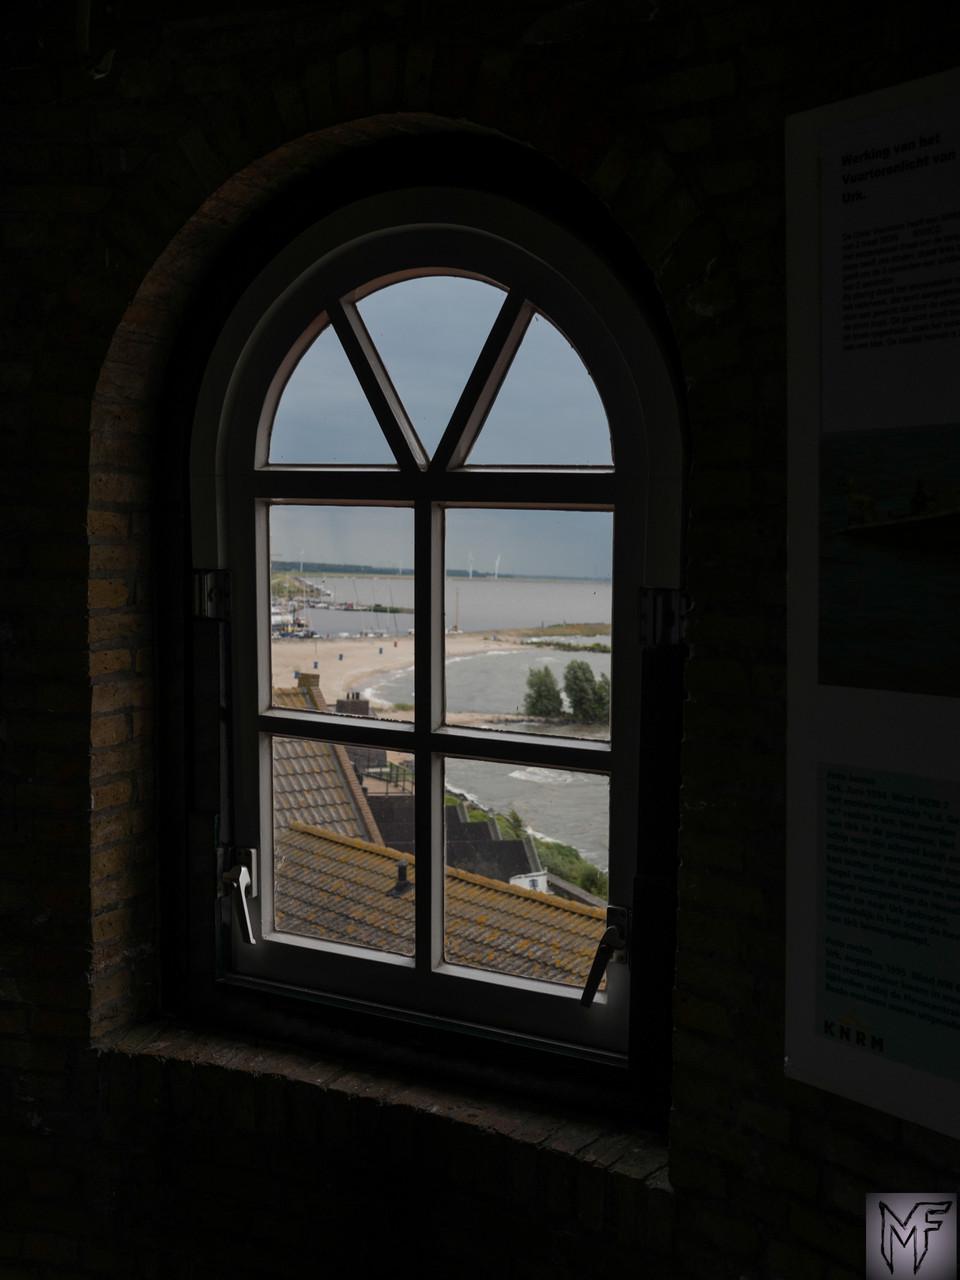 Urk, Leuchtturm, Mies Vandenbergh Fotografie